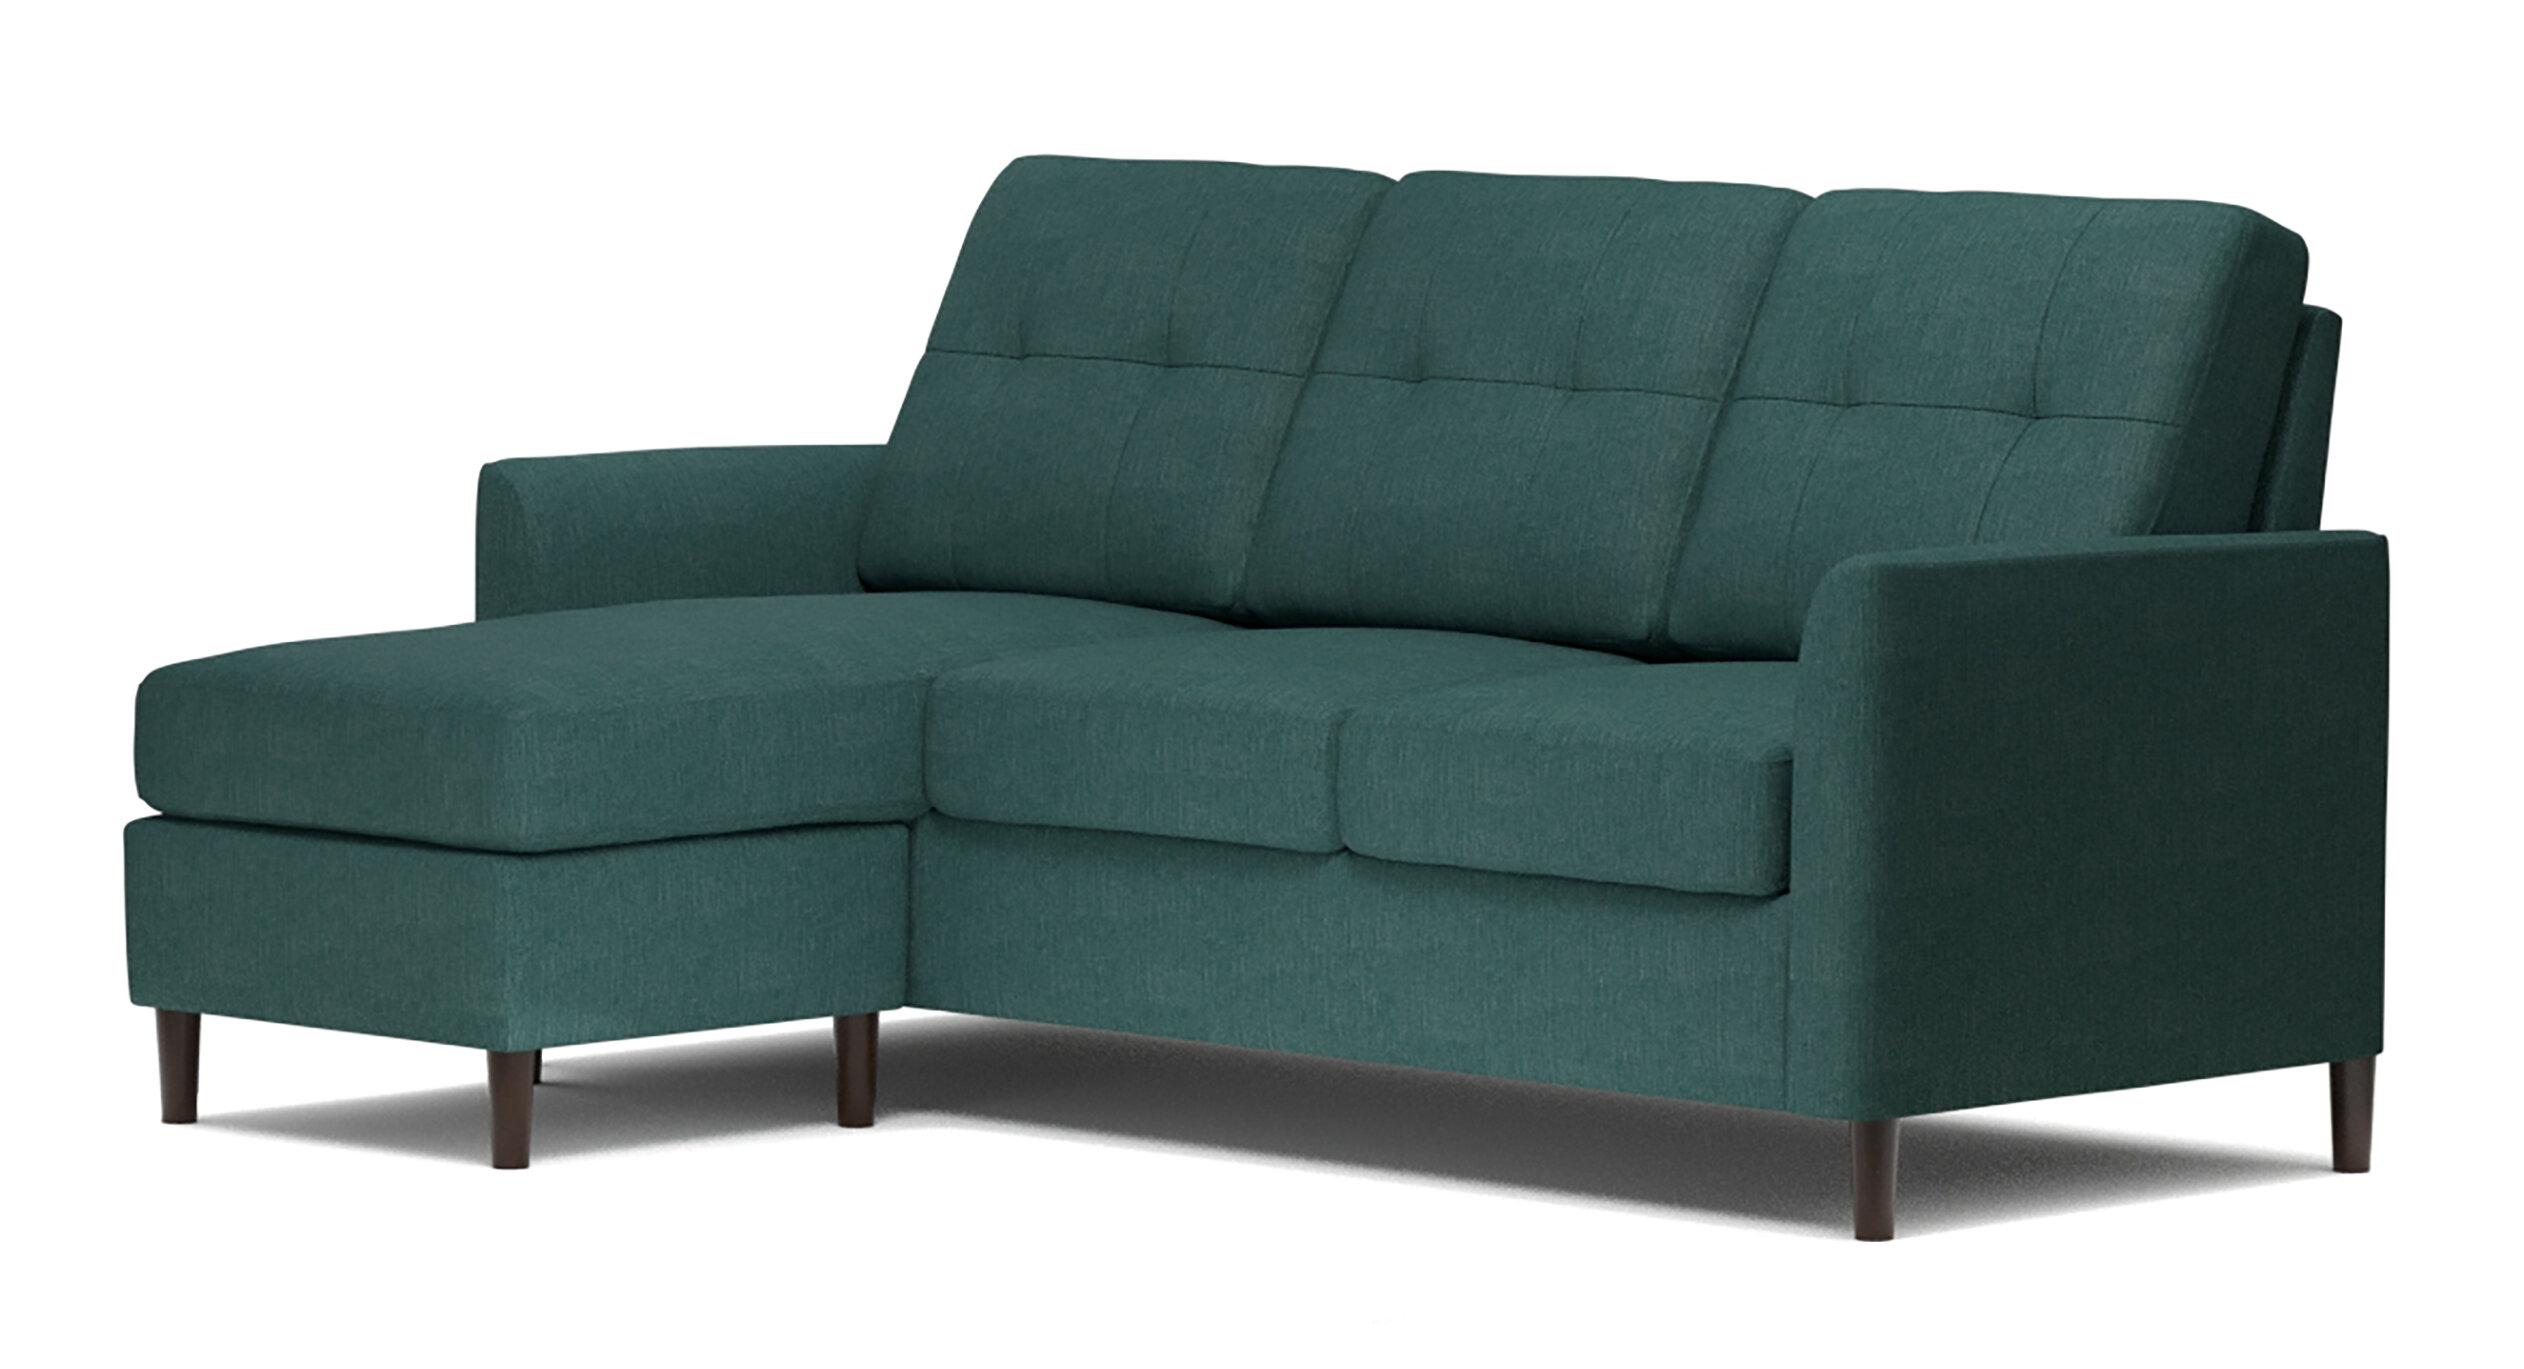 Ebern Designs Bates Reversible Sectional U0026 Reviews | Wayfair